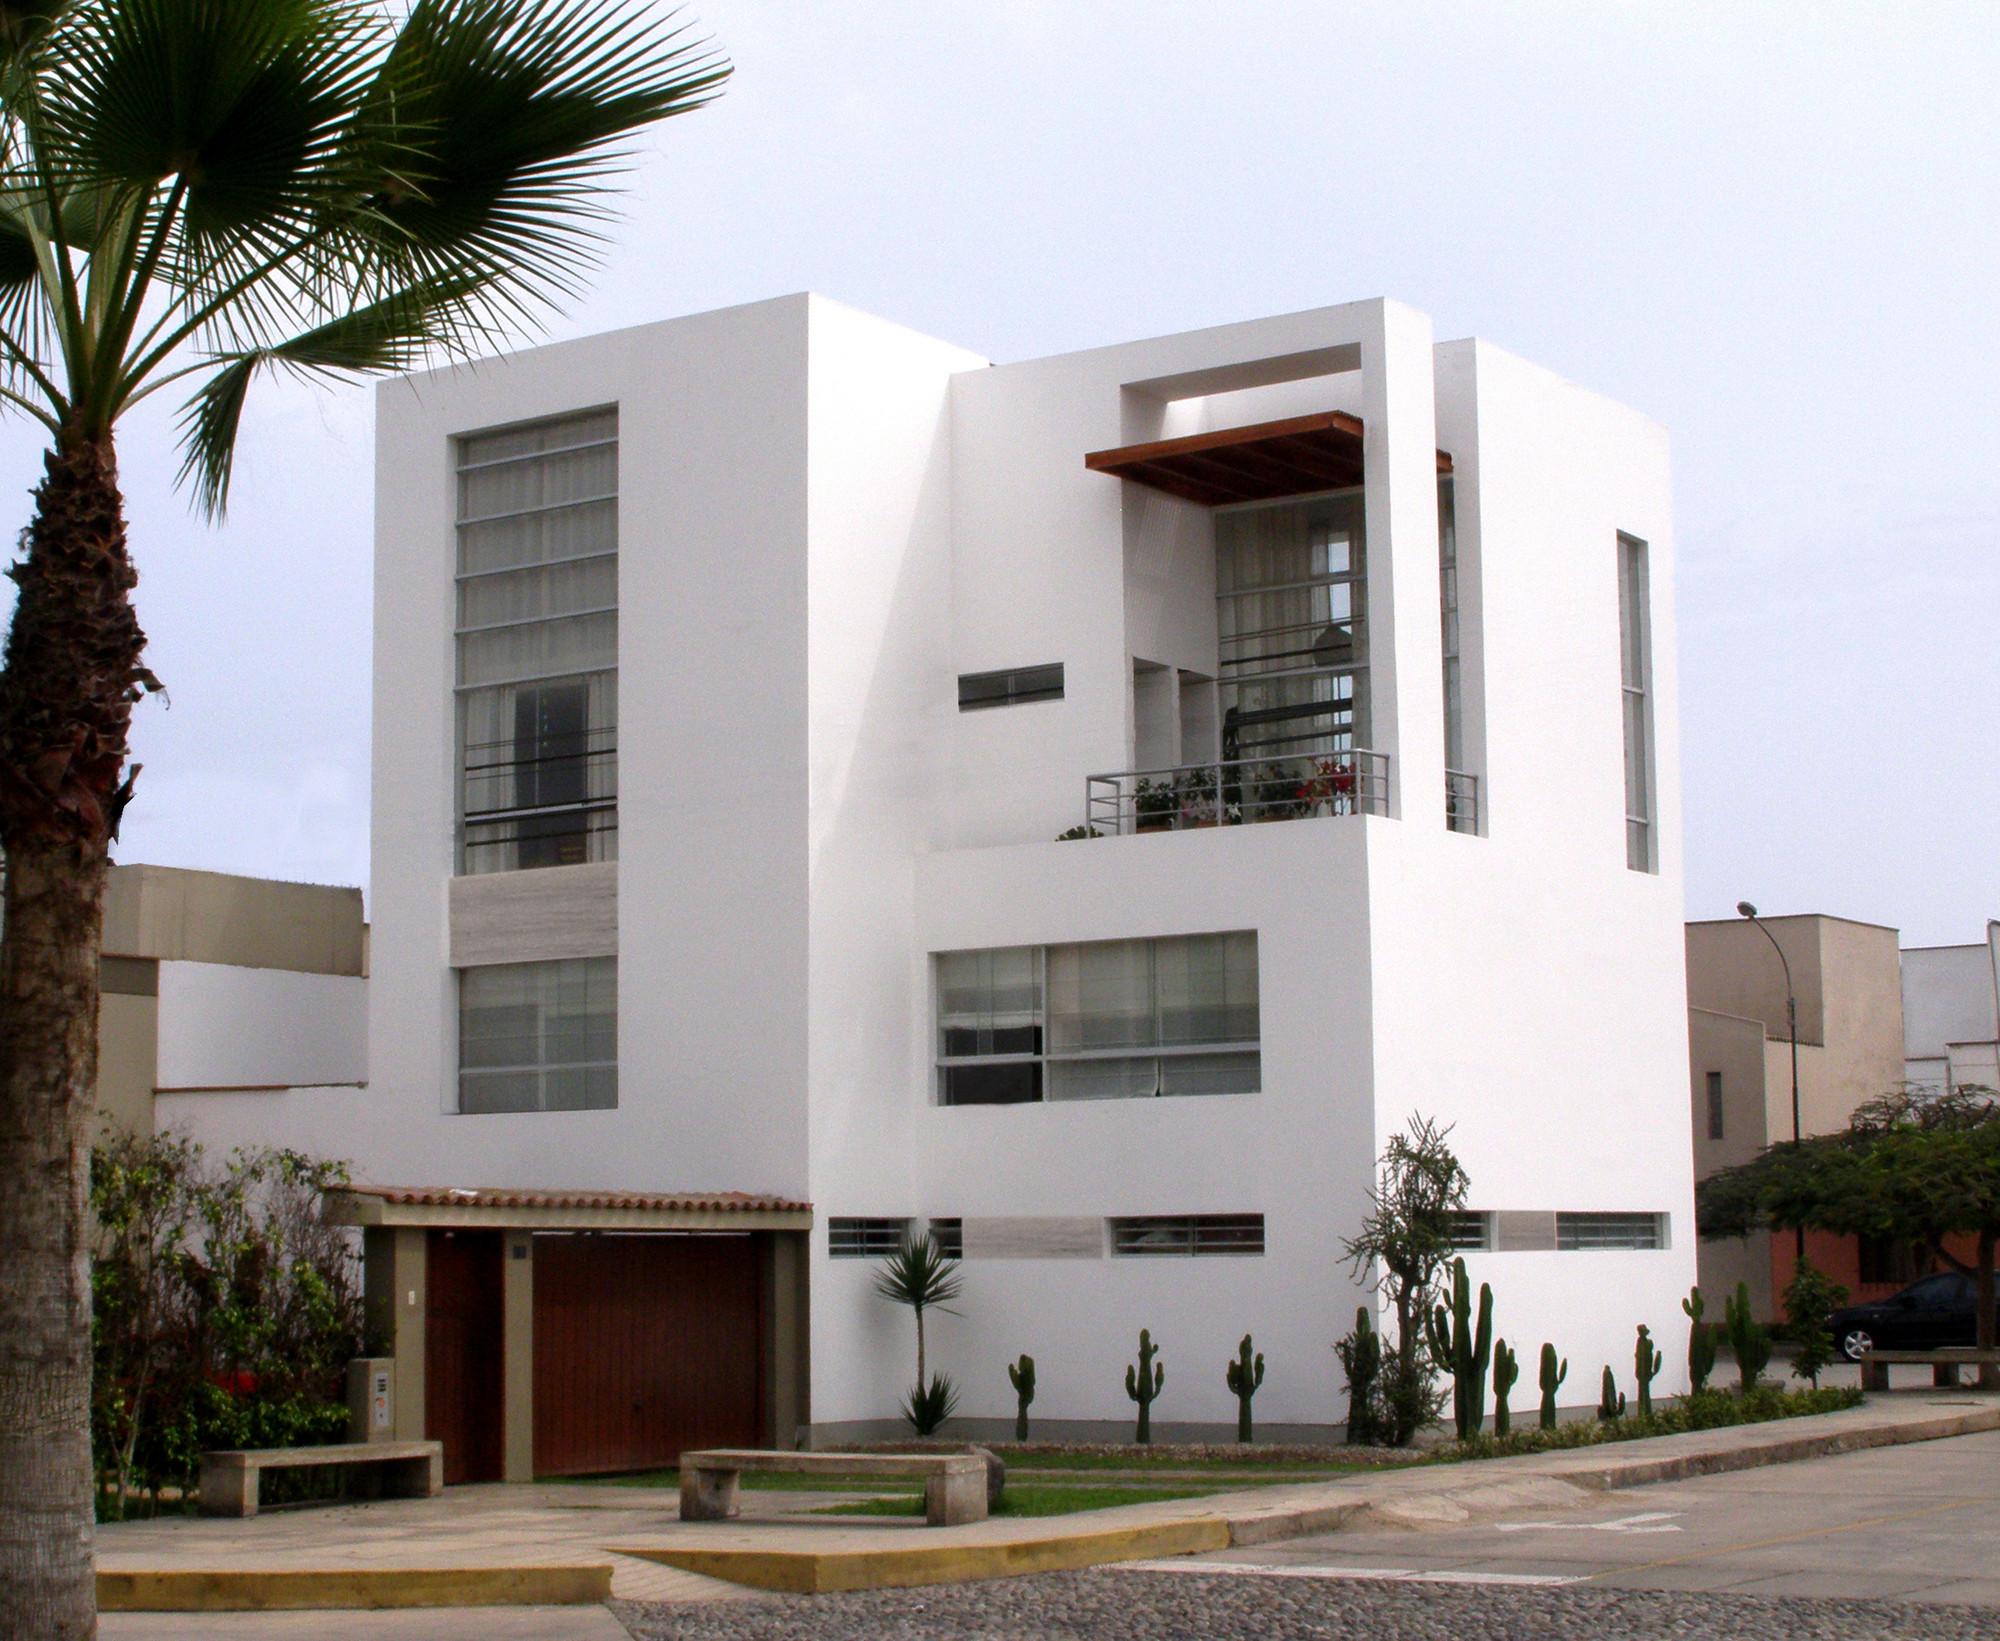 Casa c a f v arquitectos archdaily m xico for Casa minimalista tres pisos